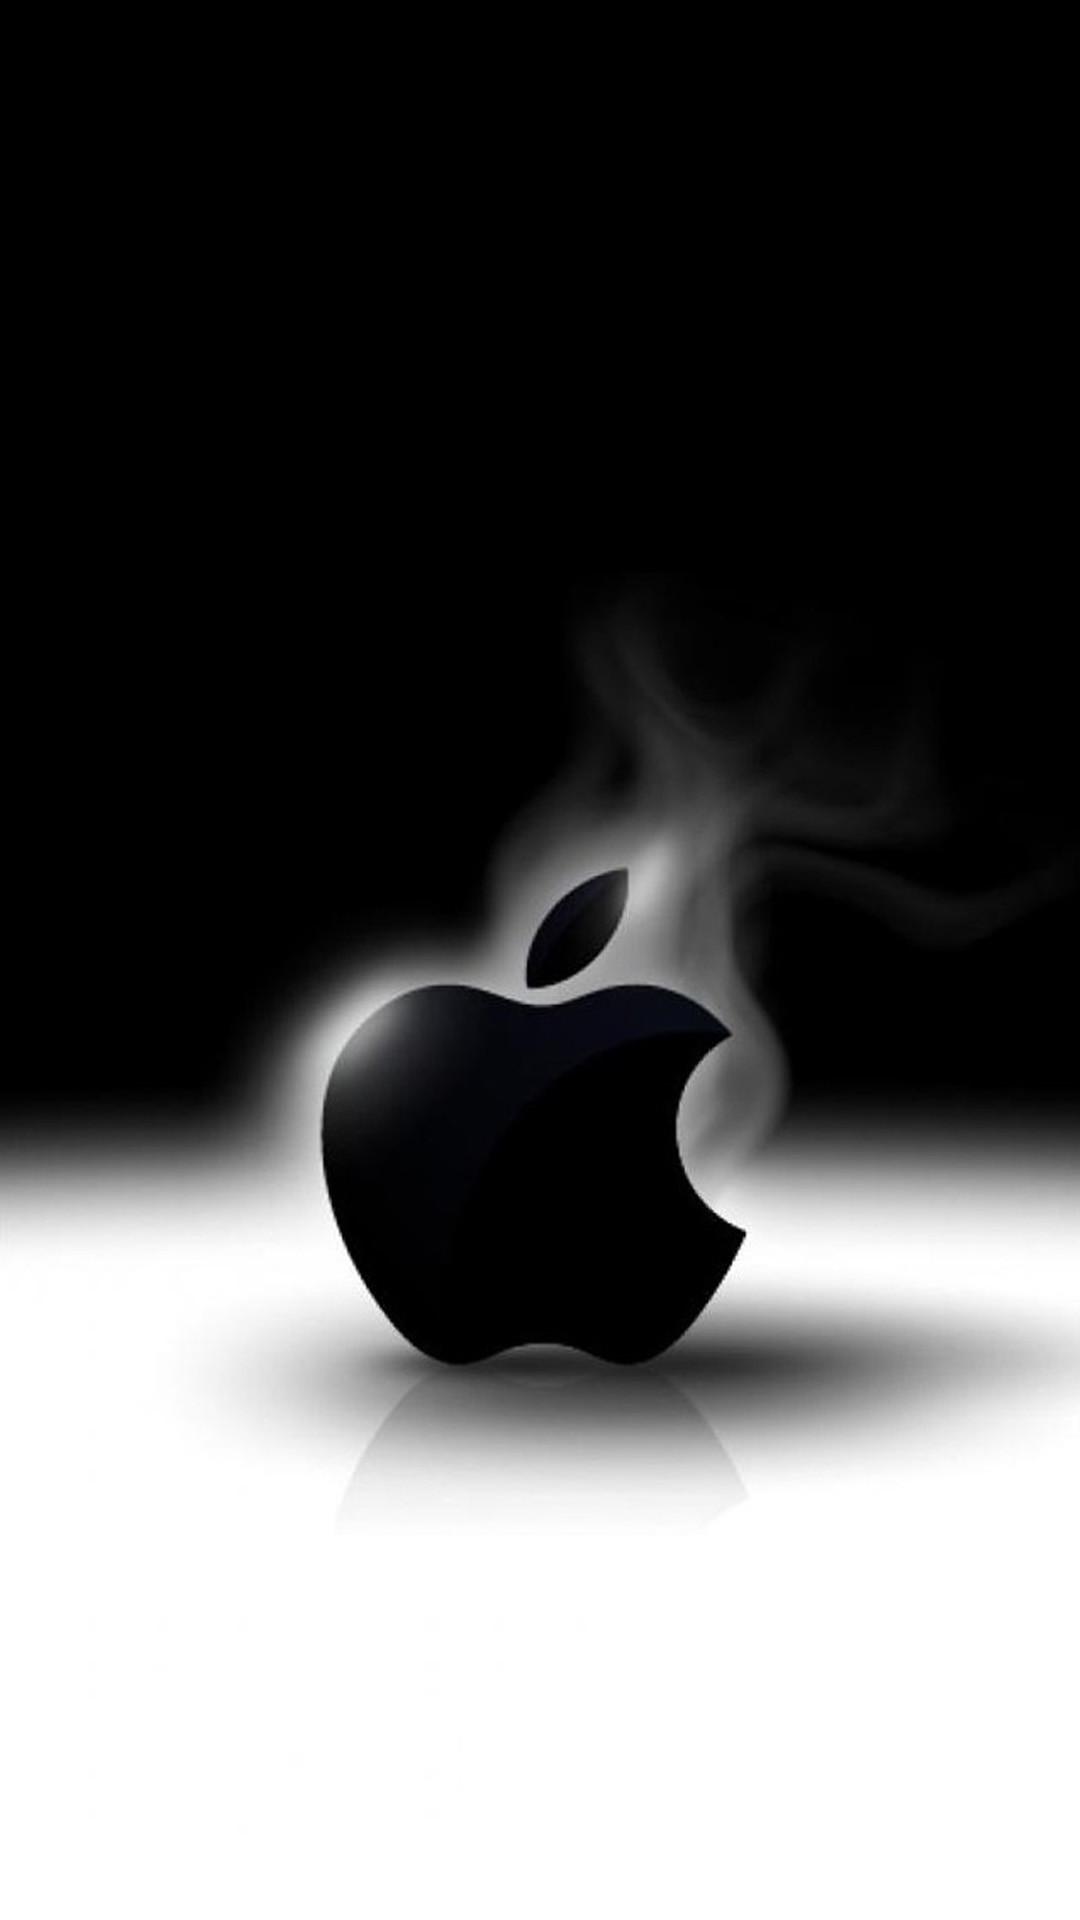 Der Iphone 6 Plus Wallpaper Thread Apple Wallpapers - Iphone Apple Wallpaper Hd - HD Wallpaper